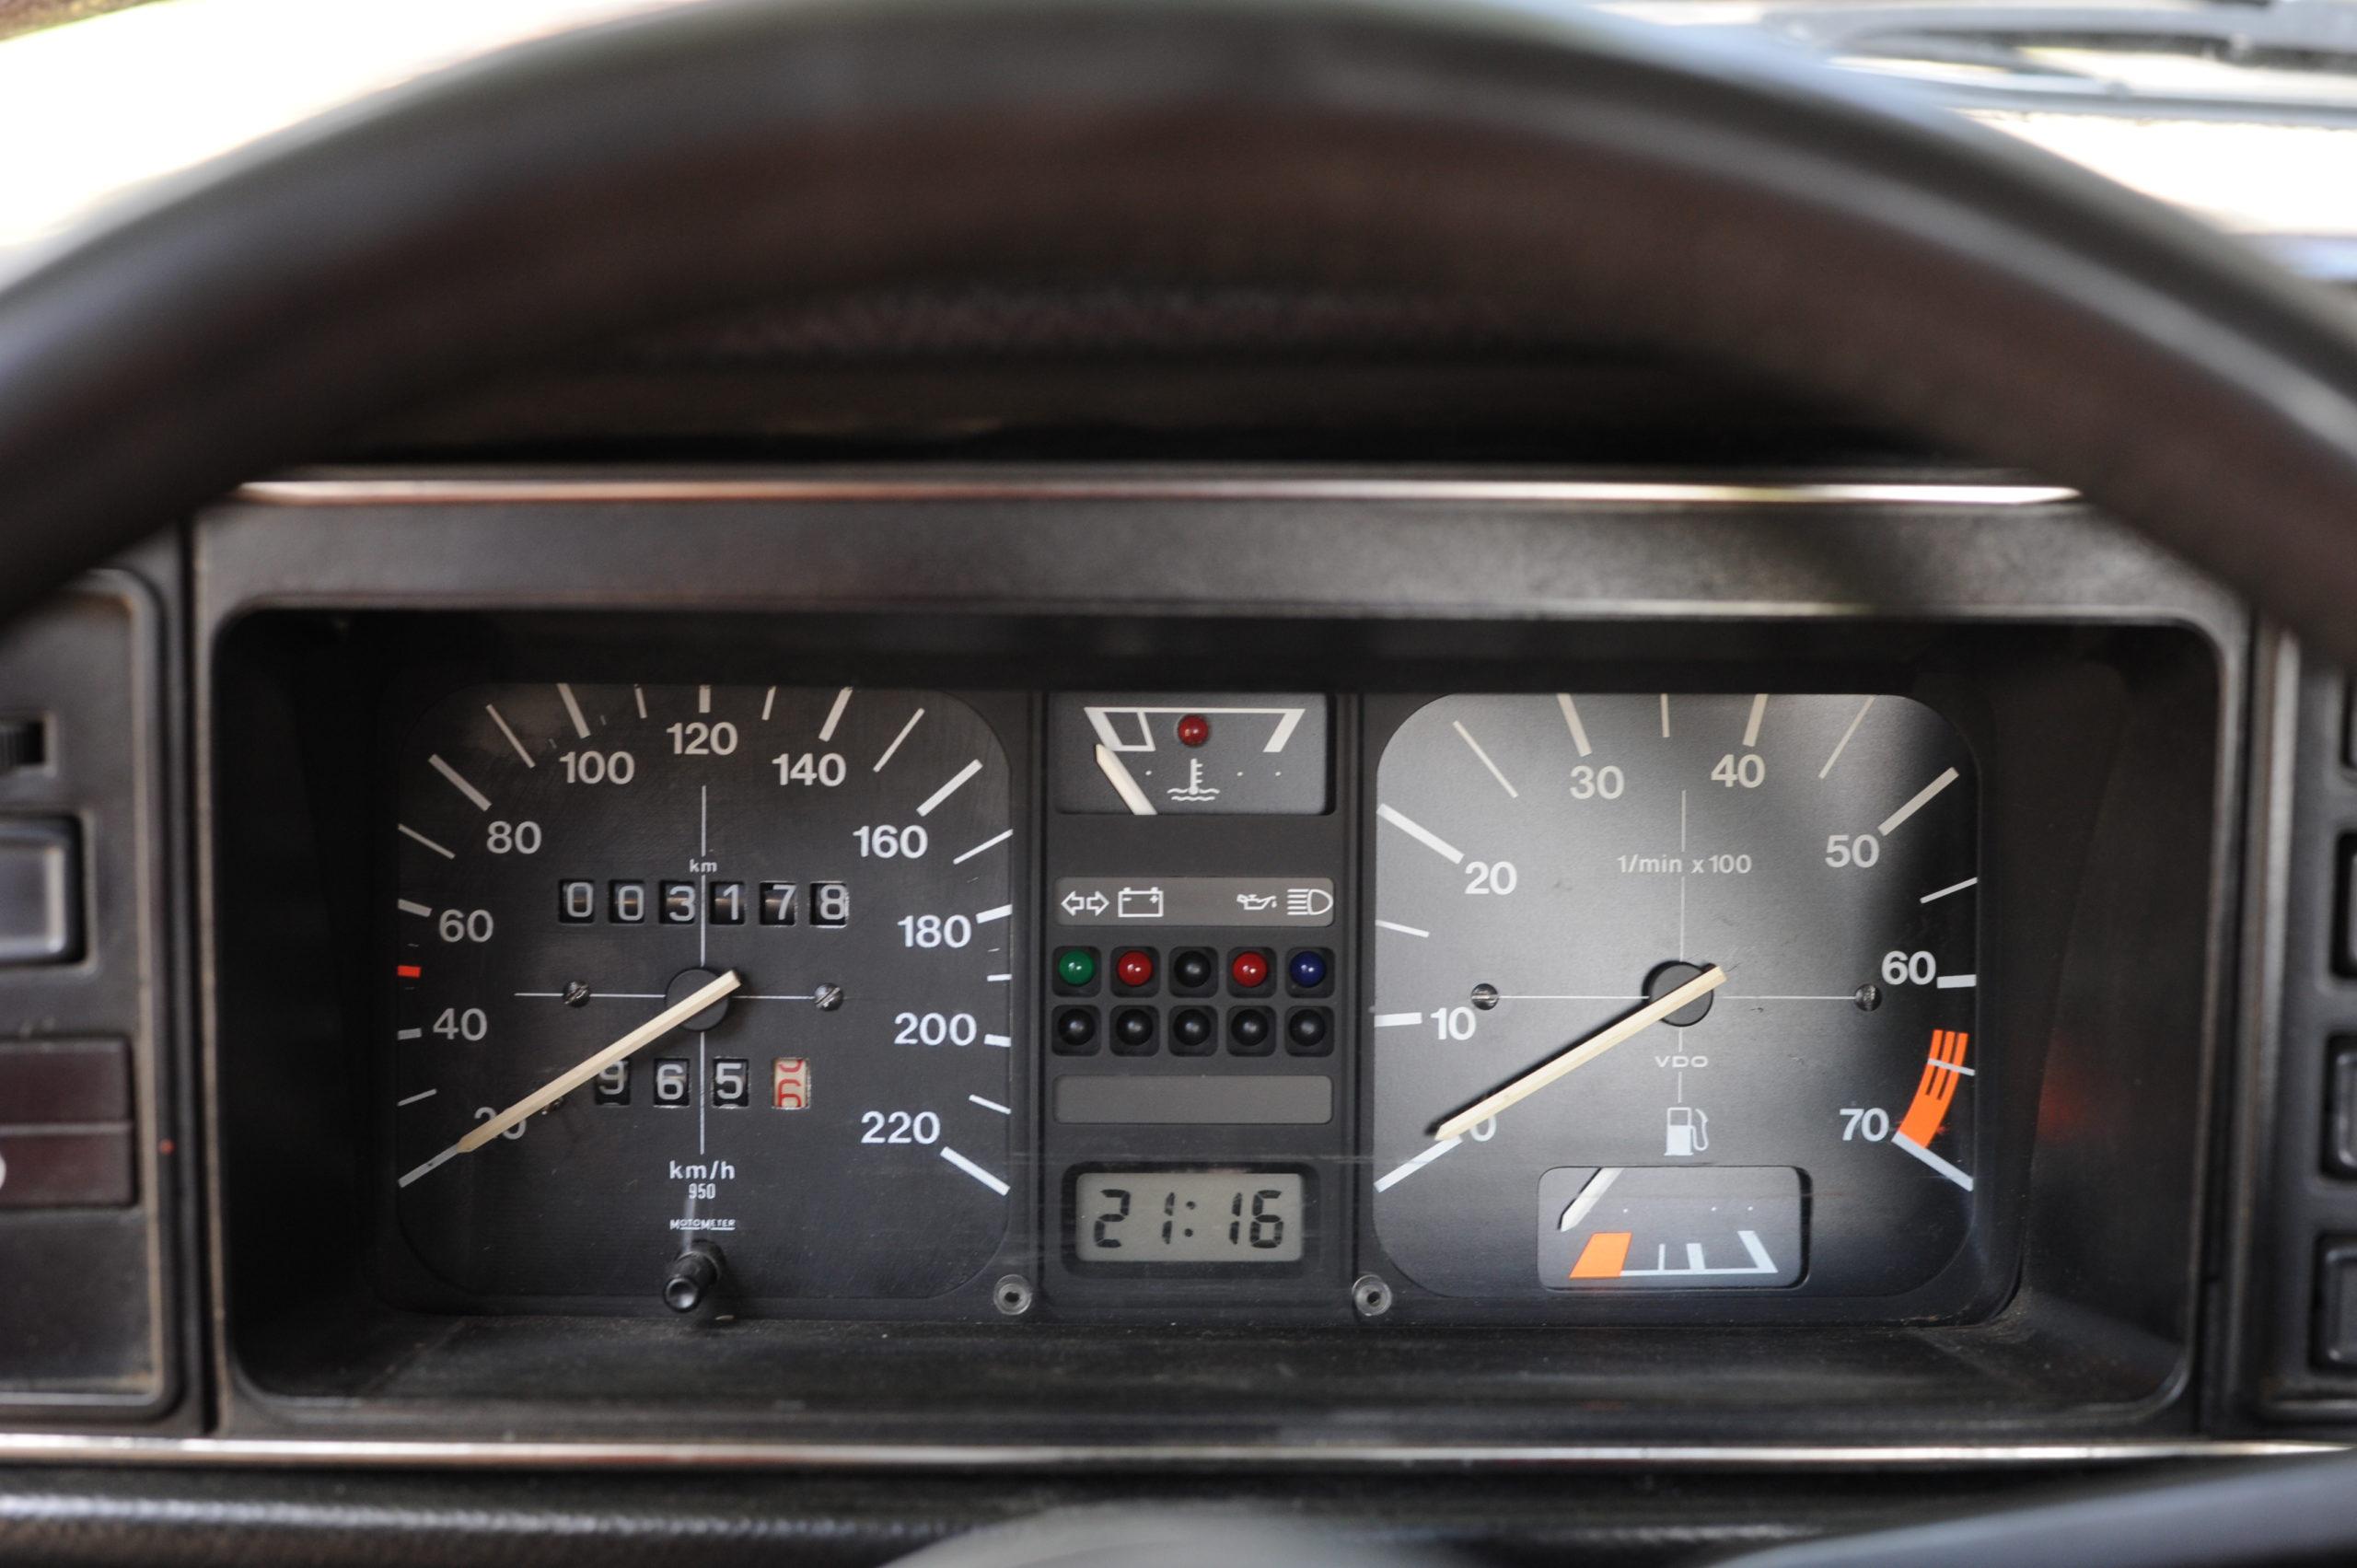 Tuning-VW-Caddy-Typ-14d-zegary